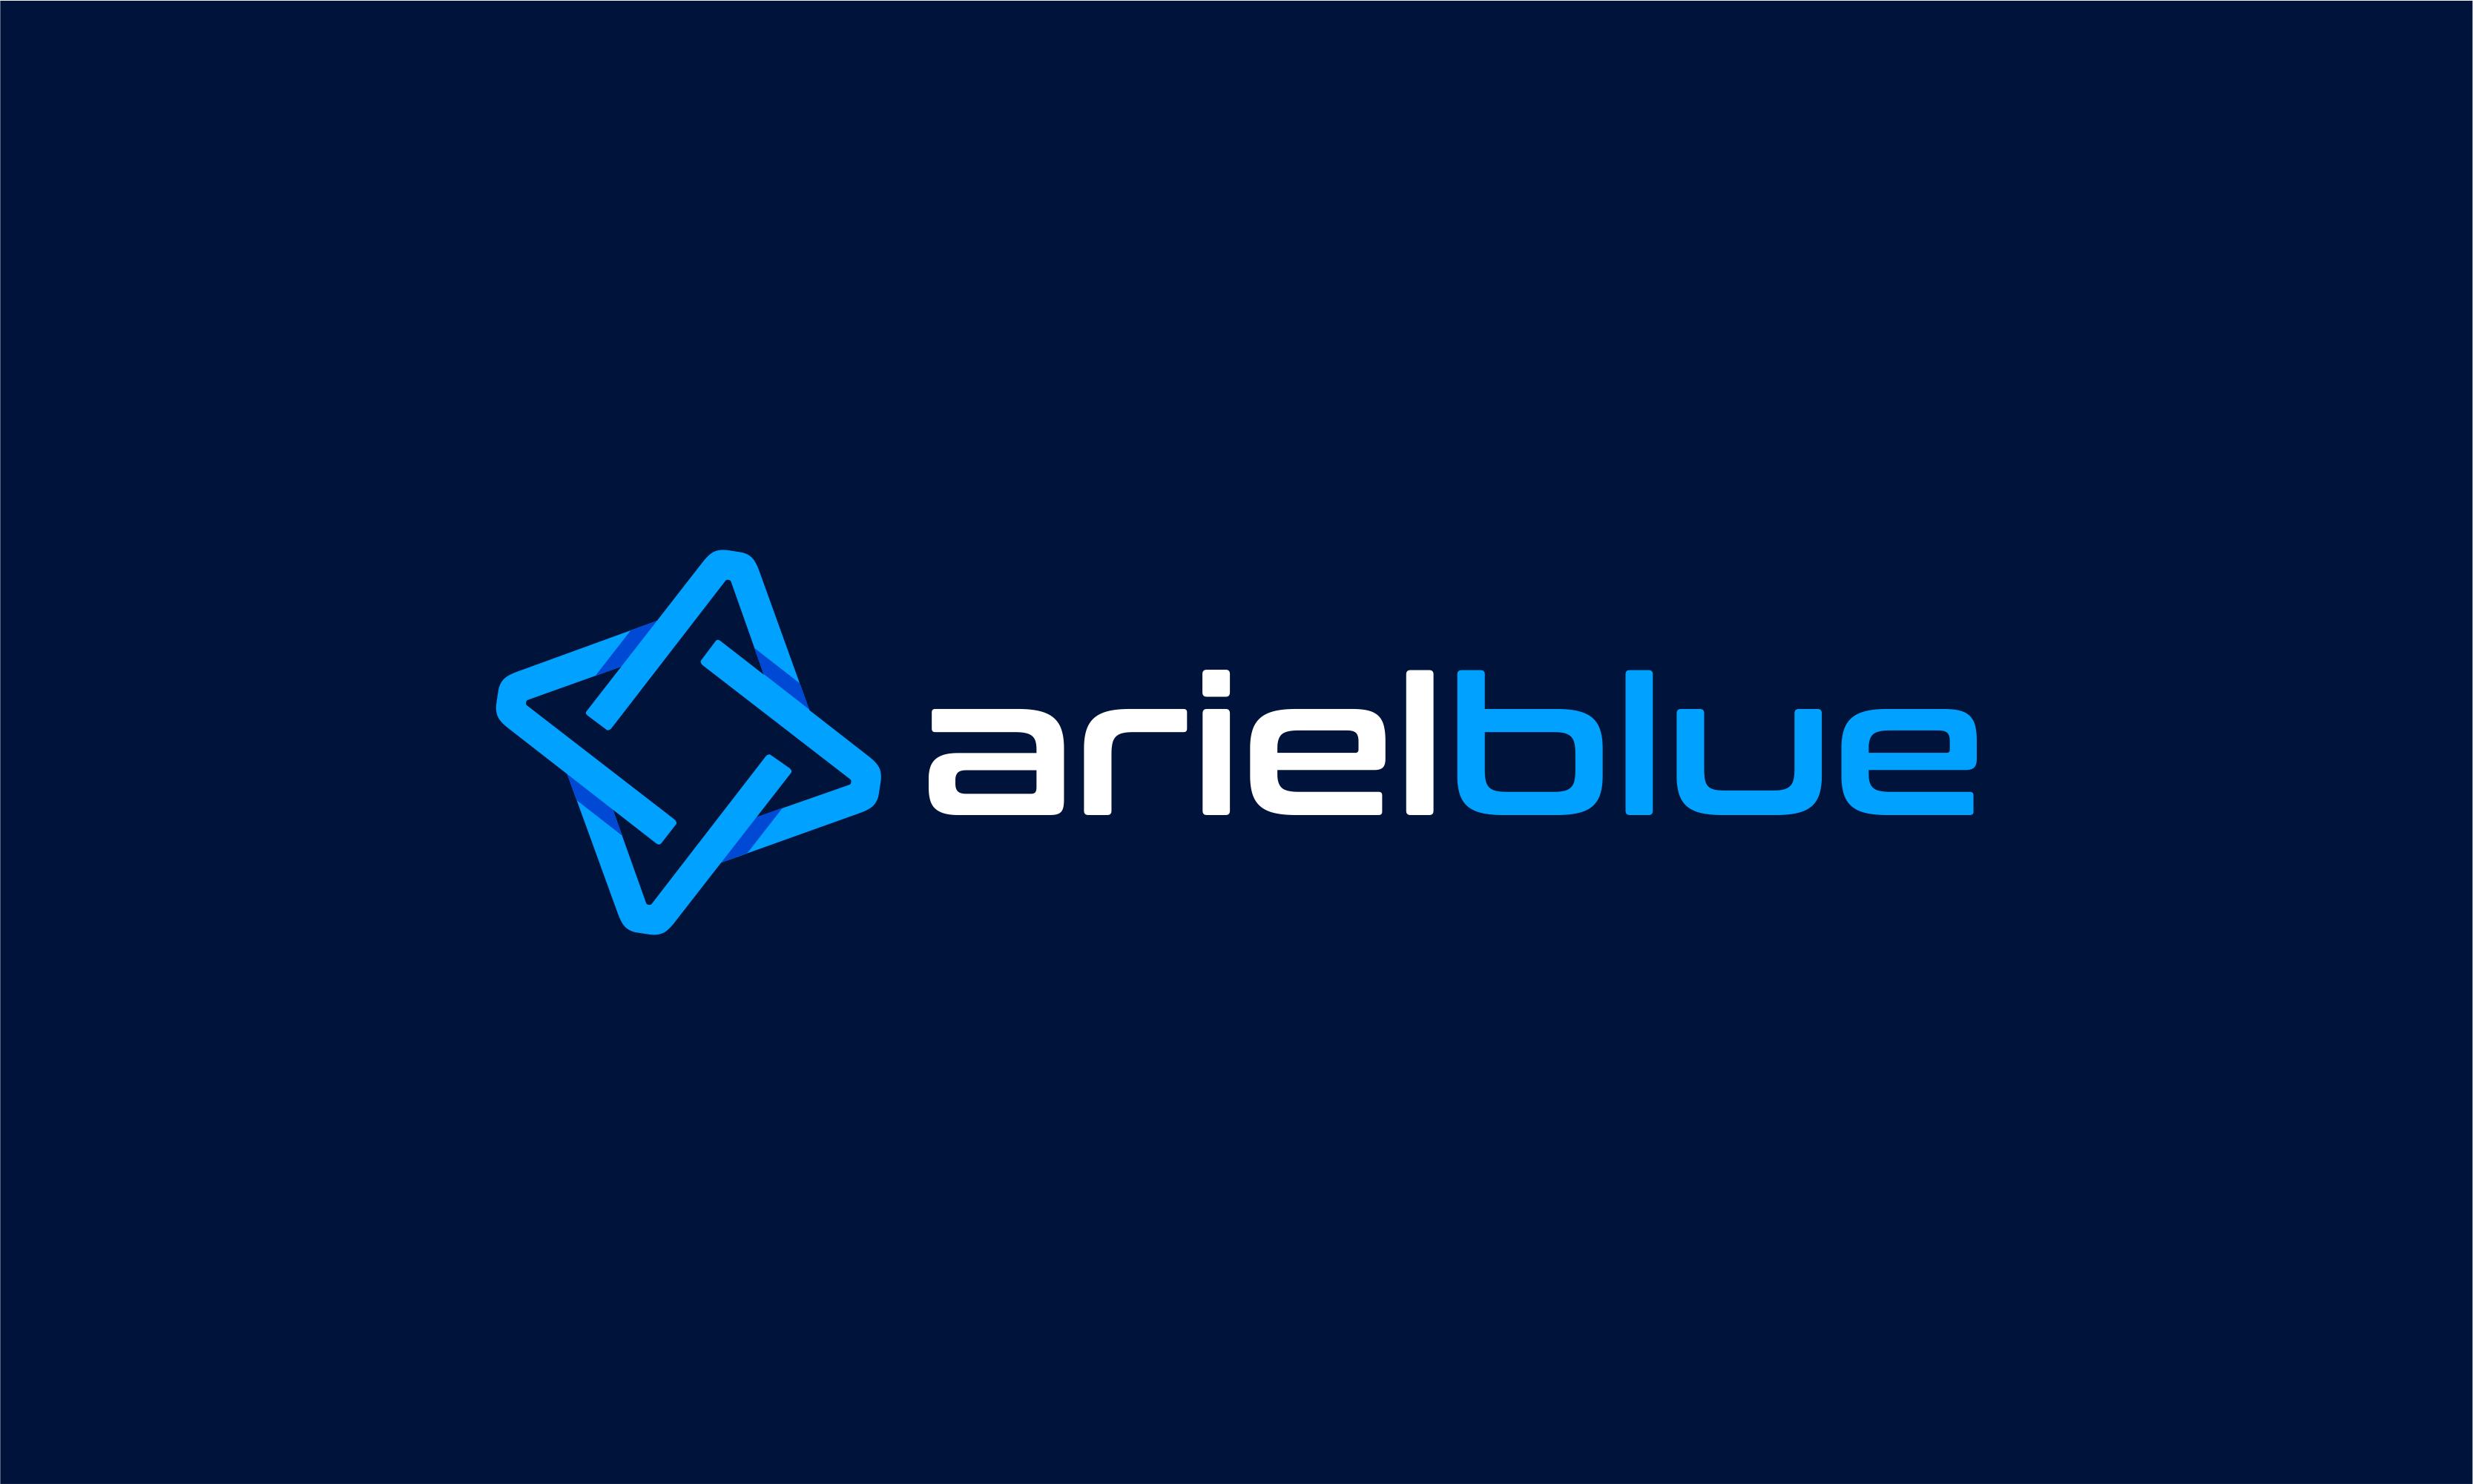 Arielblue